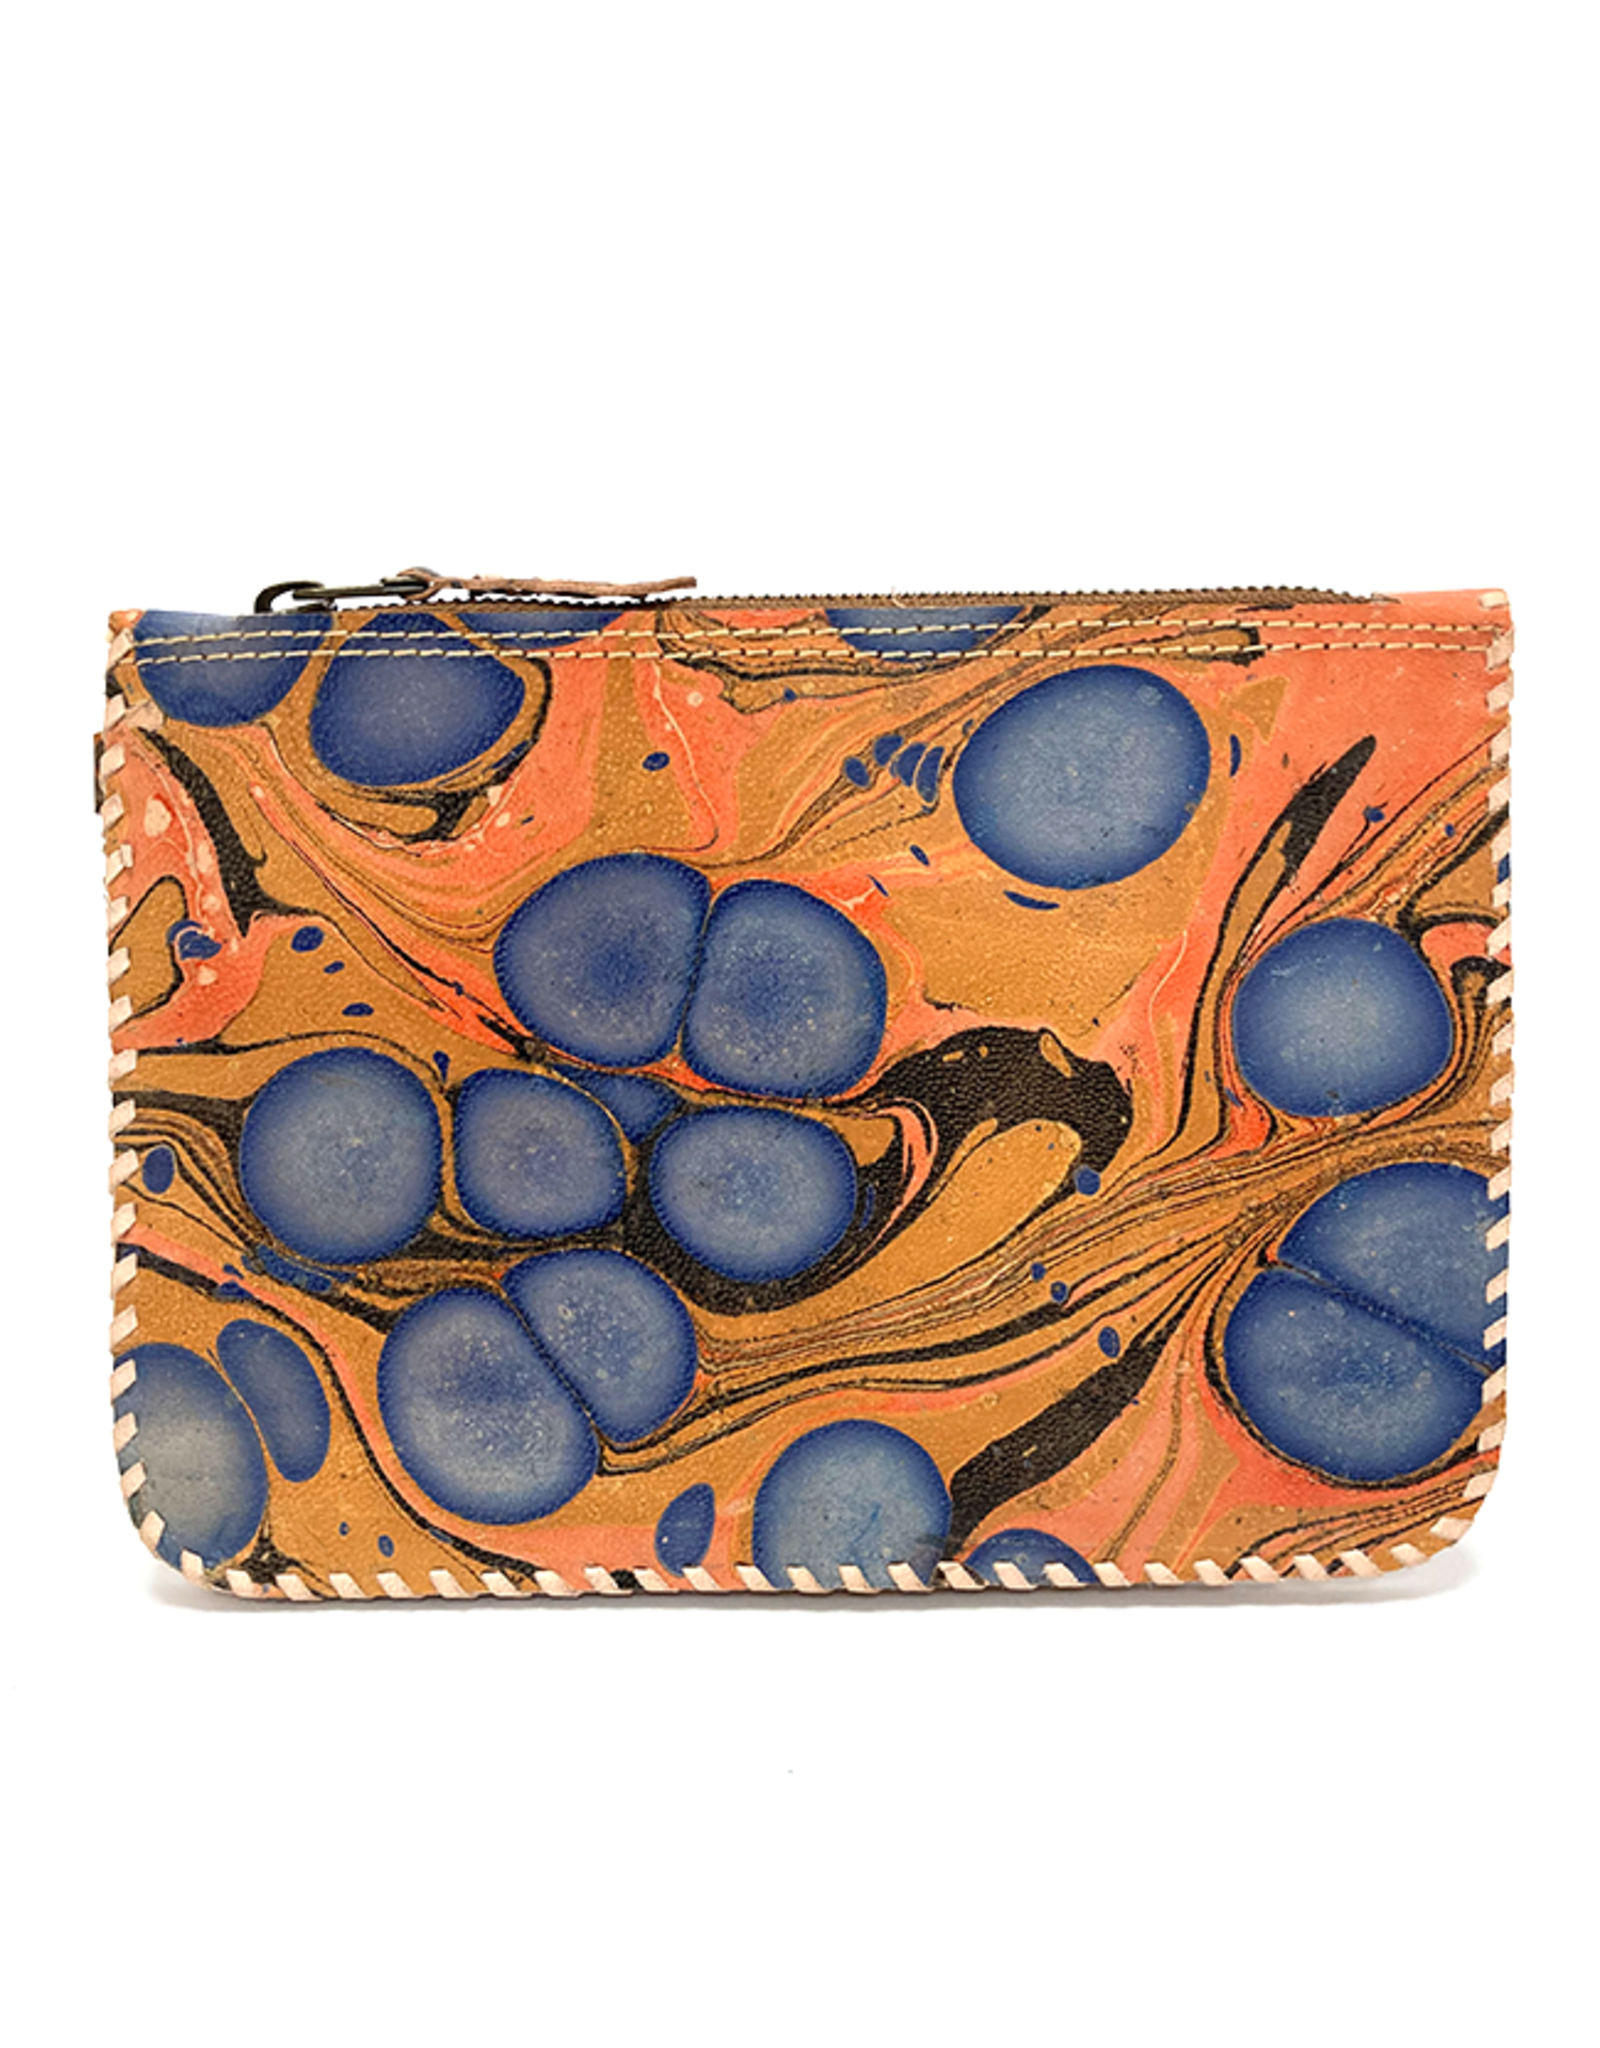 Indigo Orange Marbled Leather Wristlet Pouch